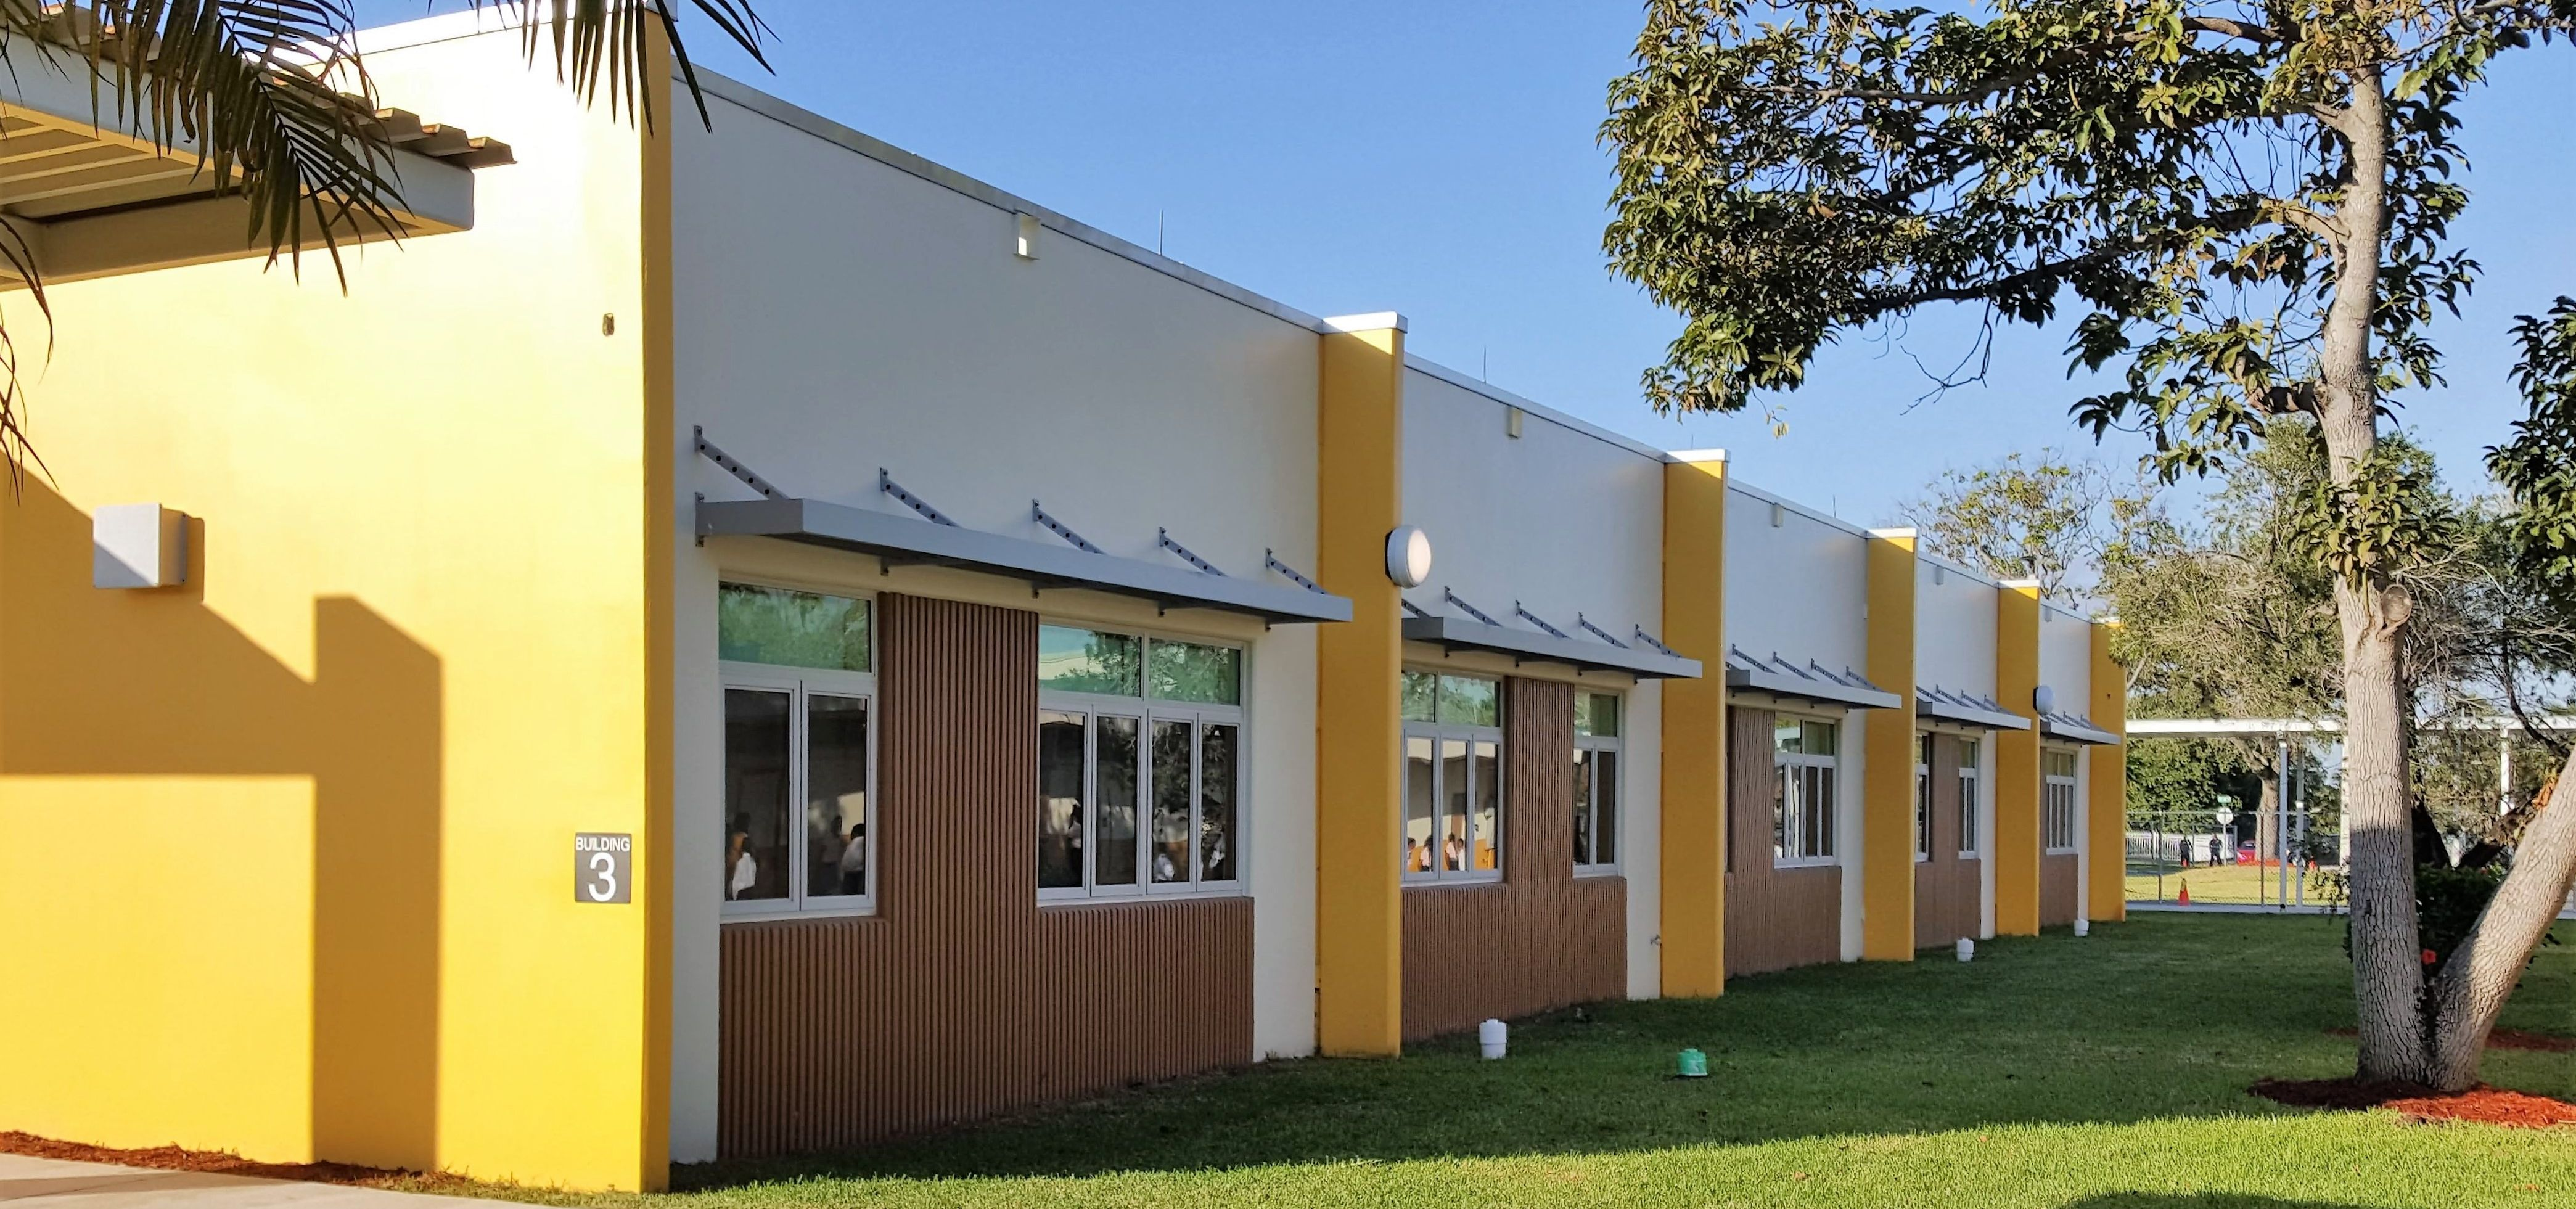 Miami-Dade Schools Investor Relations